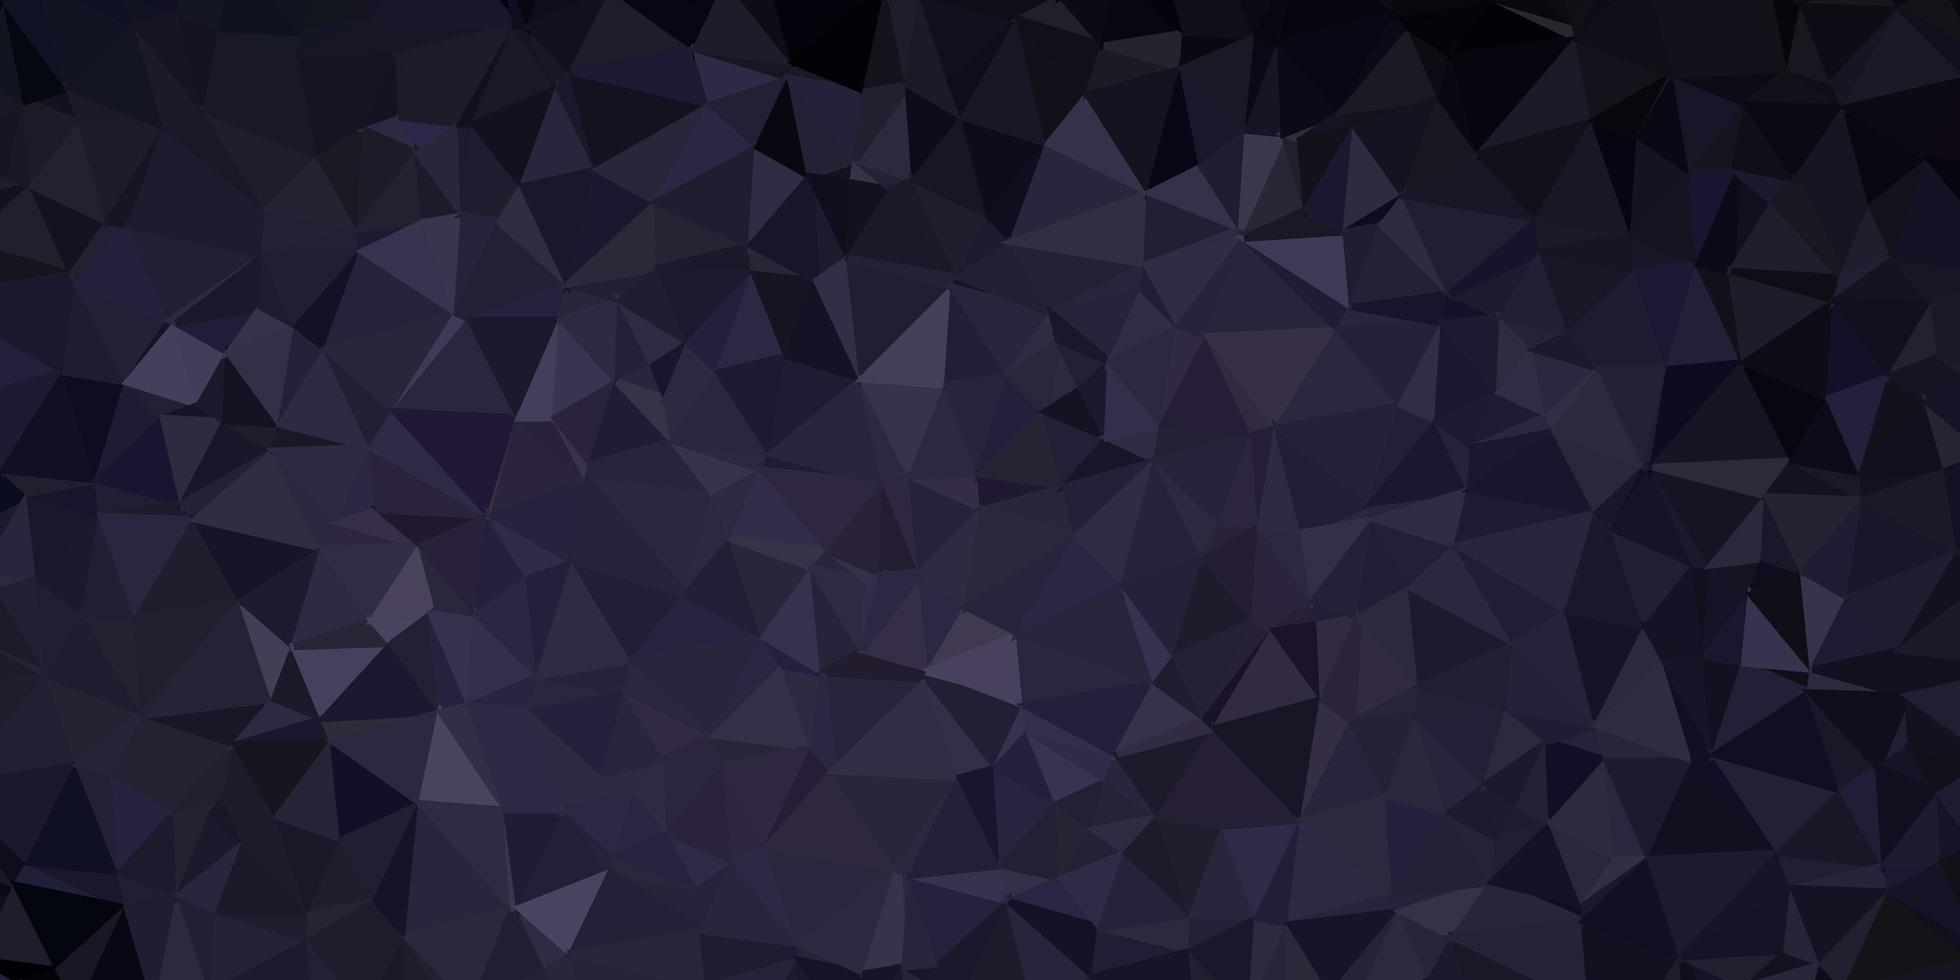 mörkgrå vektor poly triangel layout.